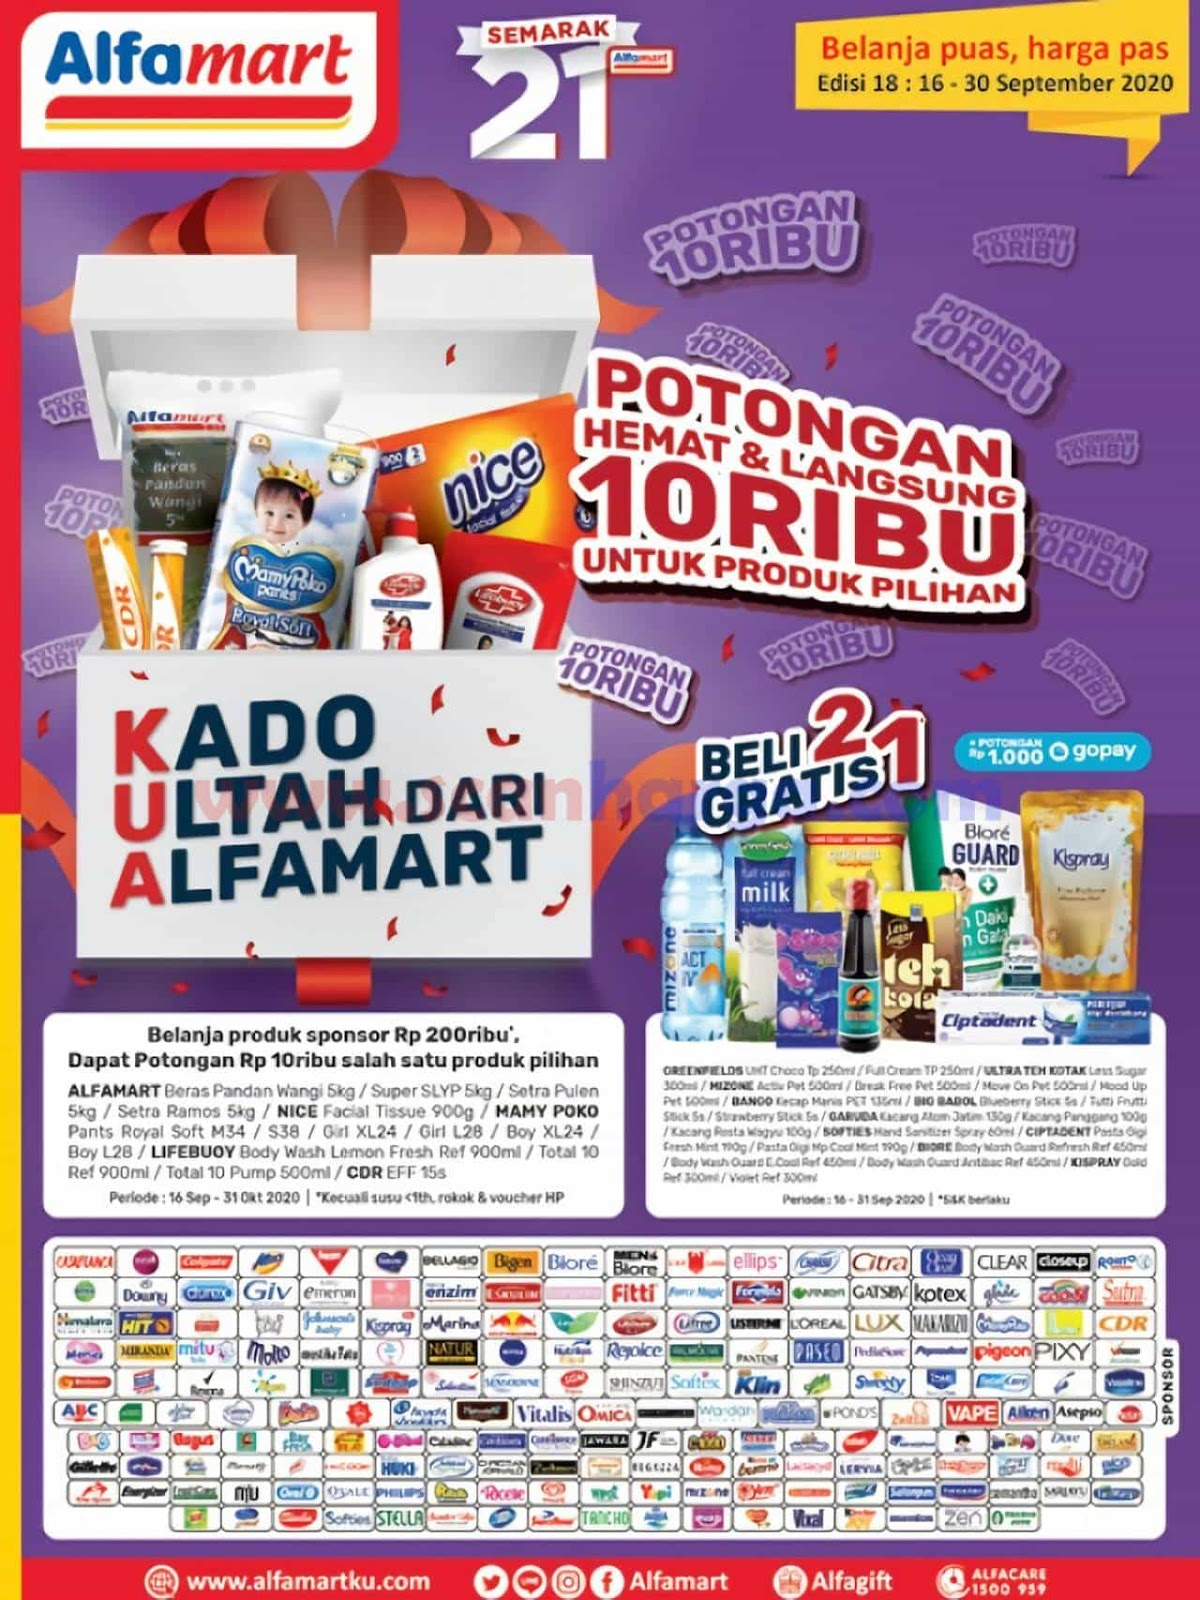 Katalog Promo Alfamart 16 - 30 September 2020 1